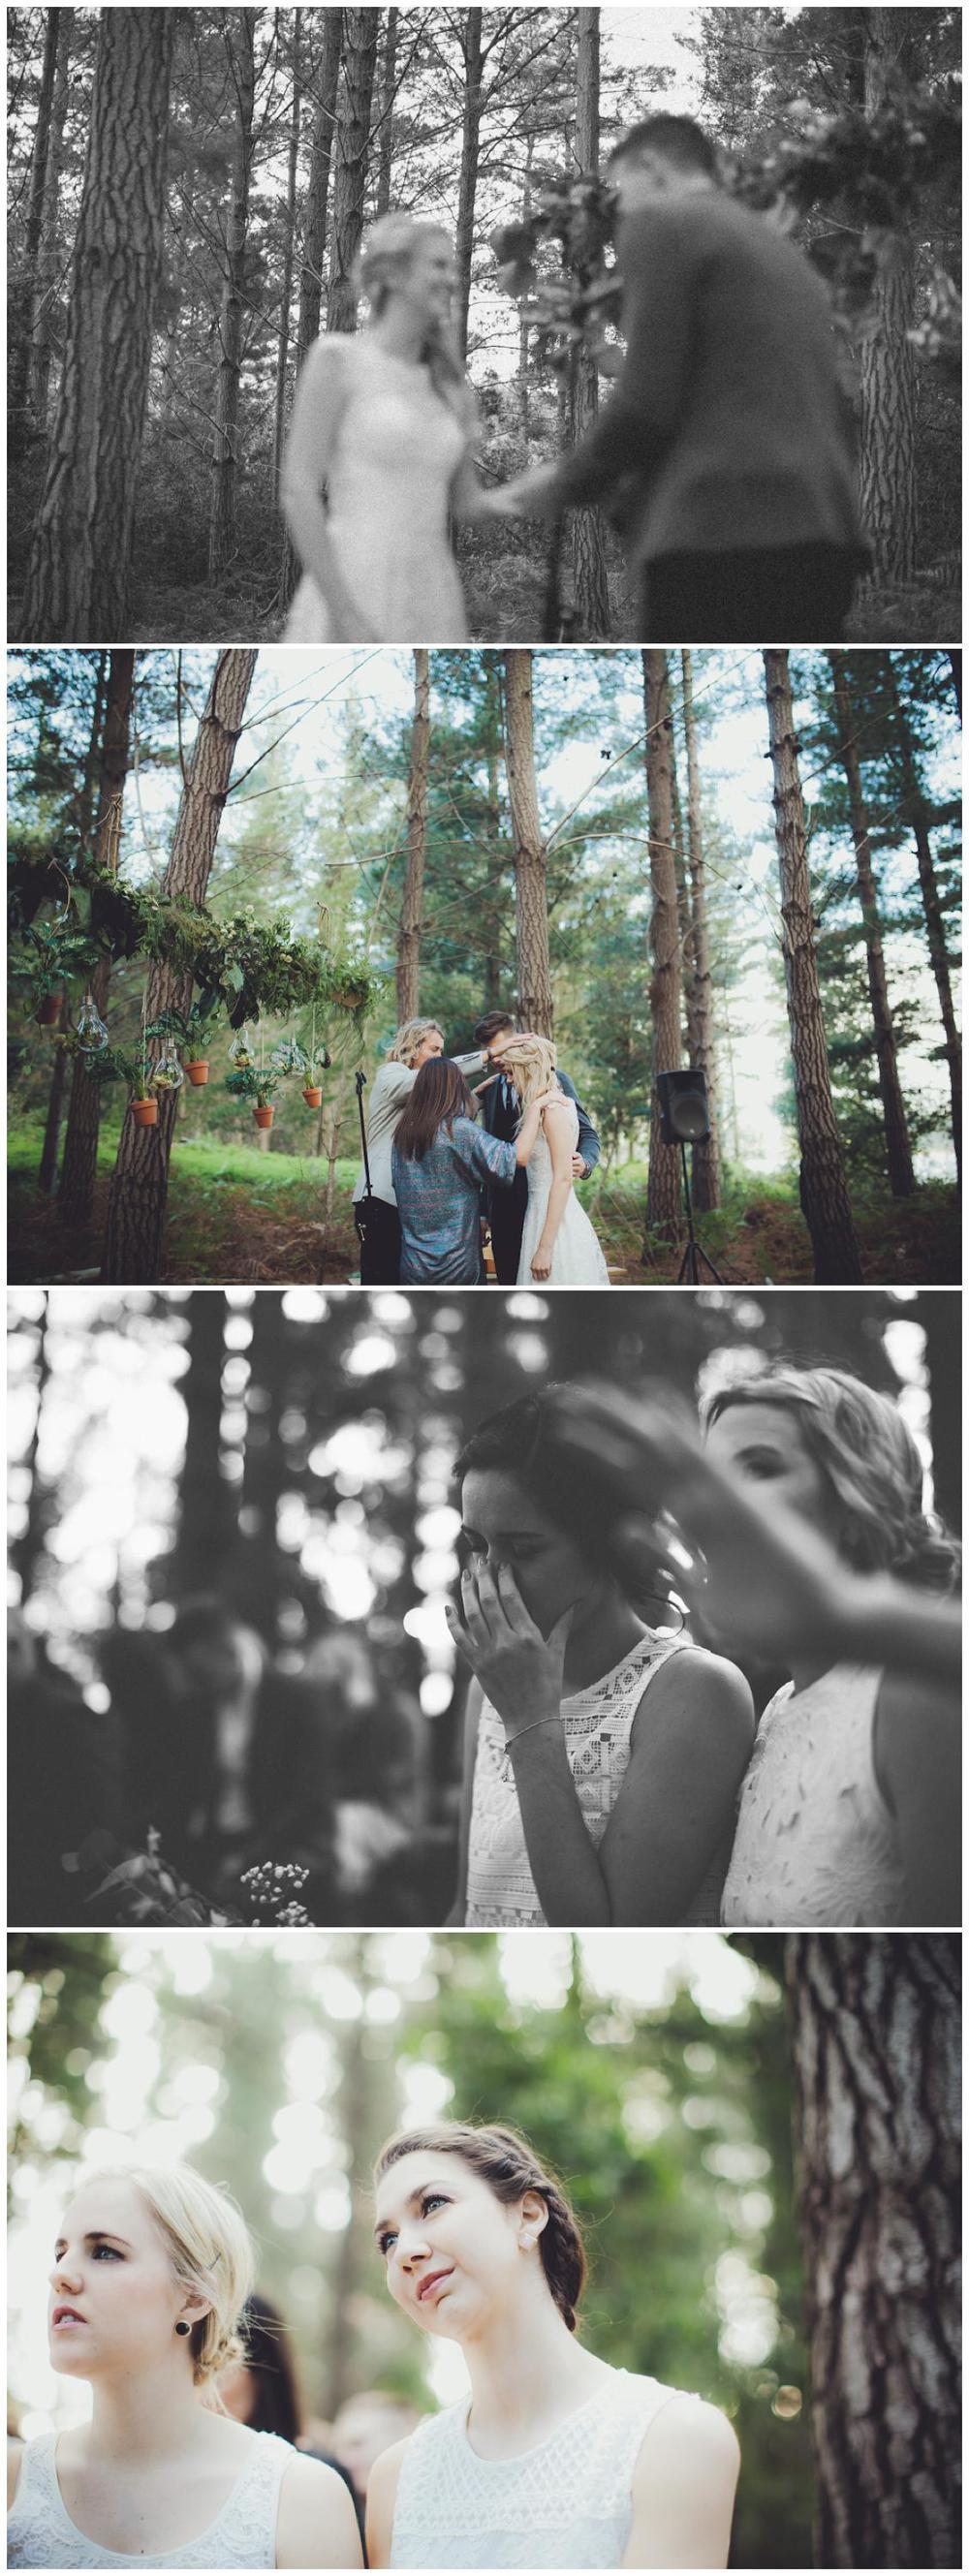 Wessel&Clarissa_FionaClairPhotography-84.jpg